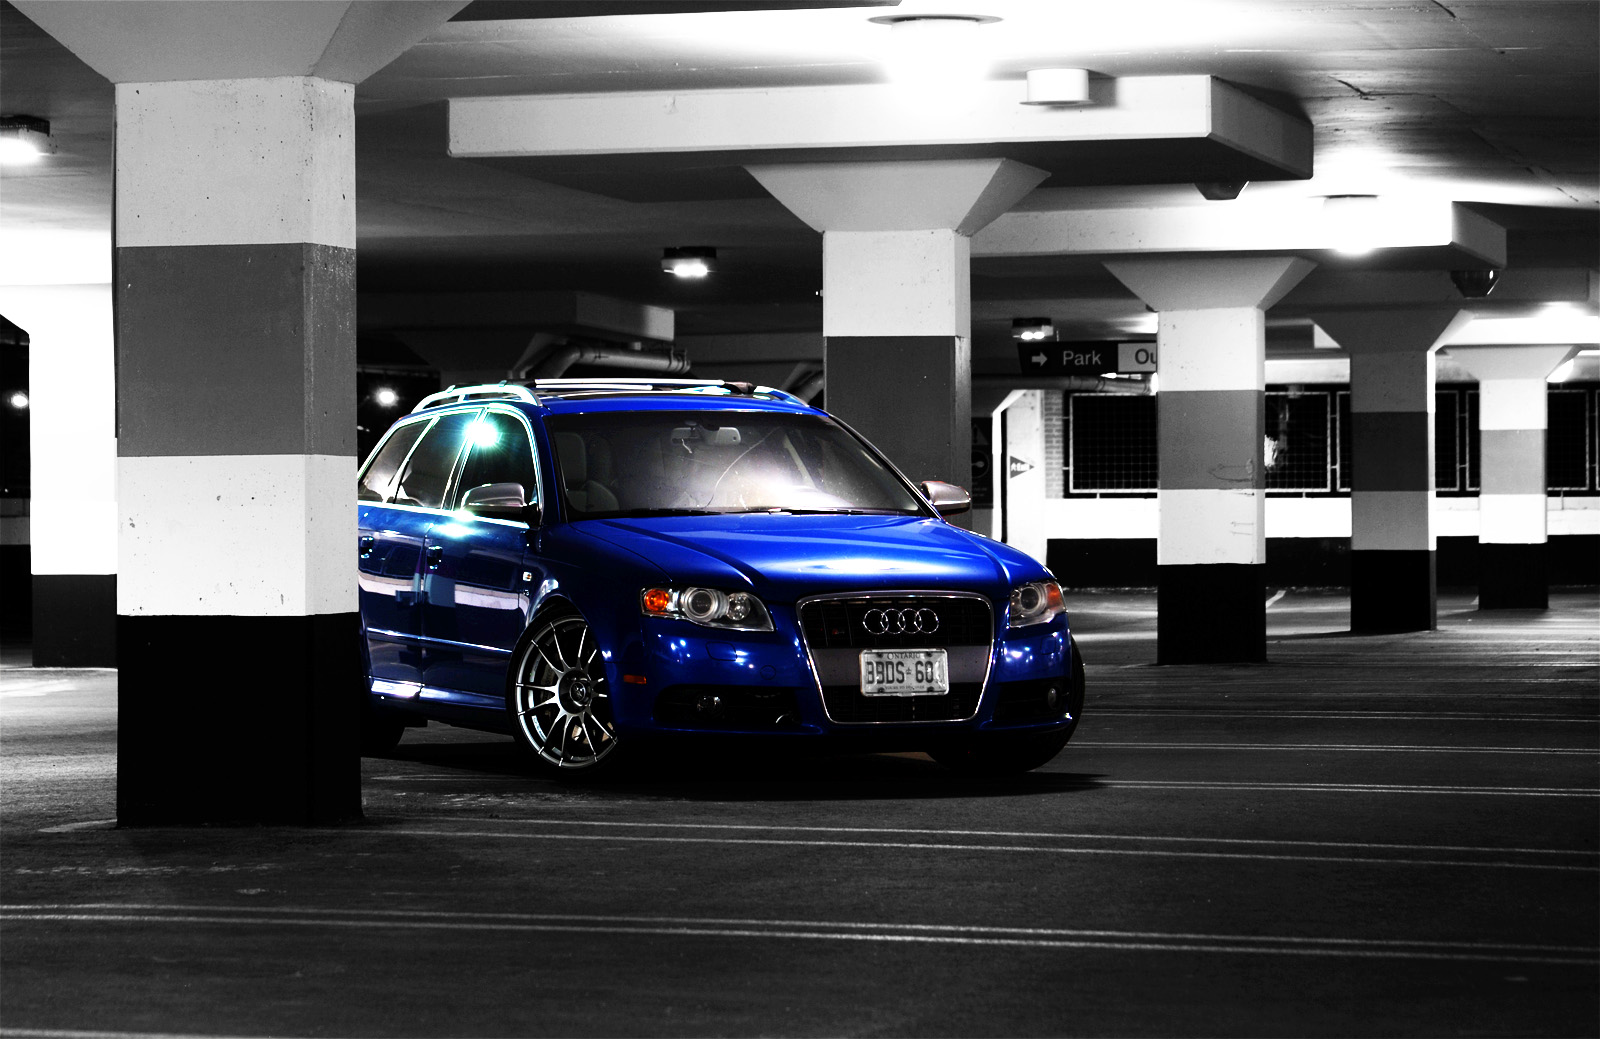 Audi A6 Wallpaper Hd Sprint Blue B7 S4 Avant Photoshoot Parking Garage Audi